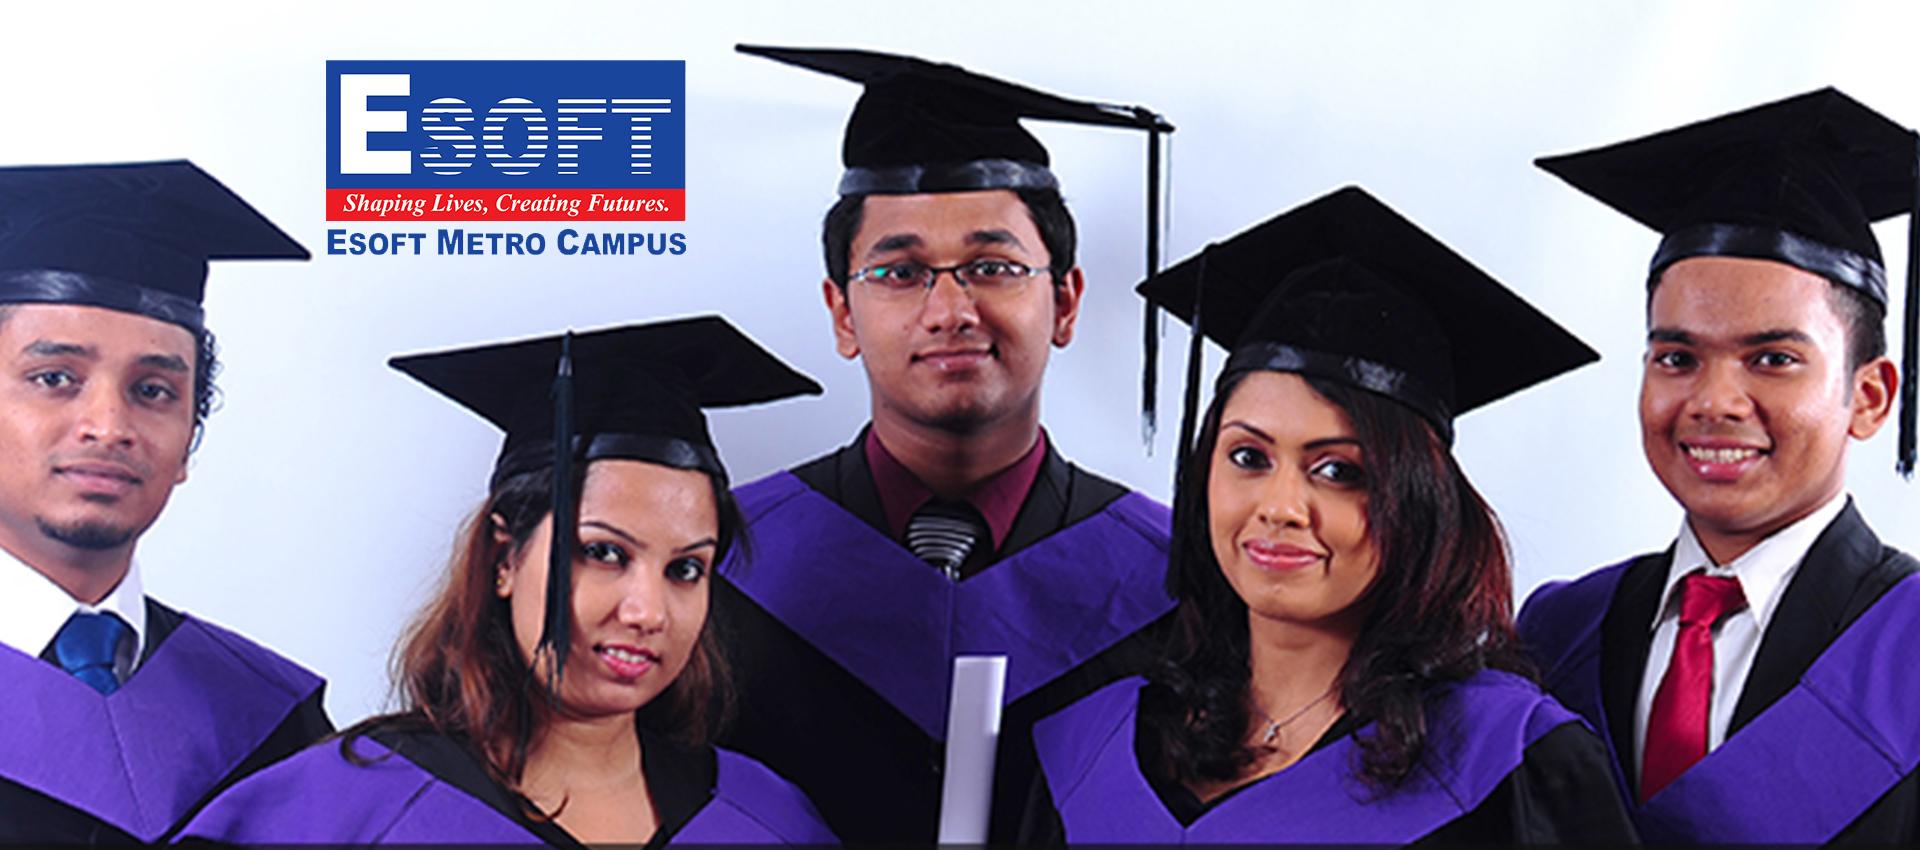 Yesman.lk - Cover Image - ESOFT Metro Campus